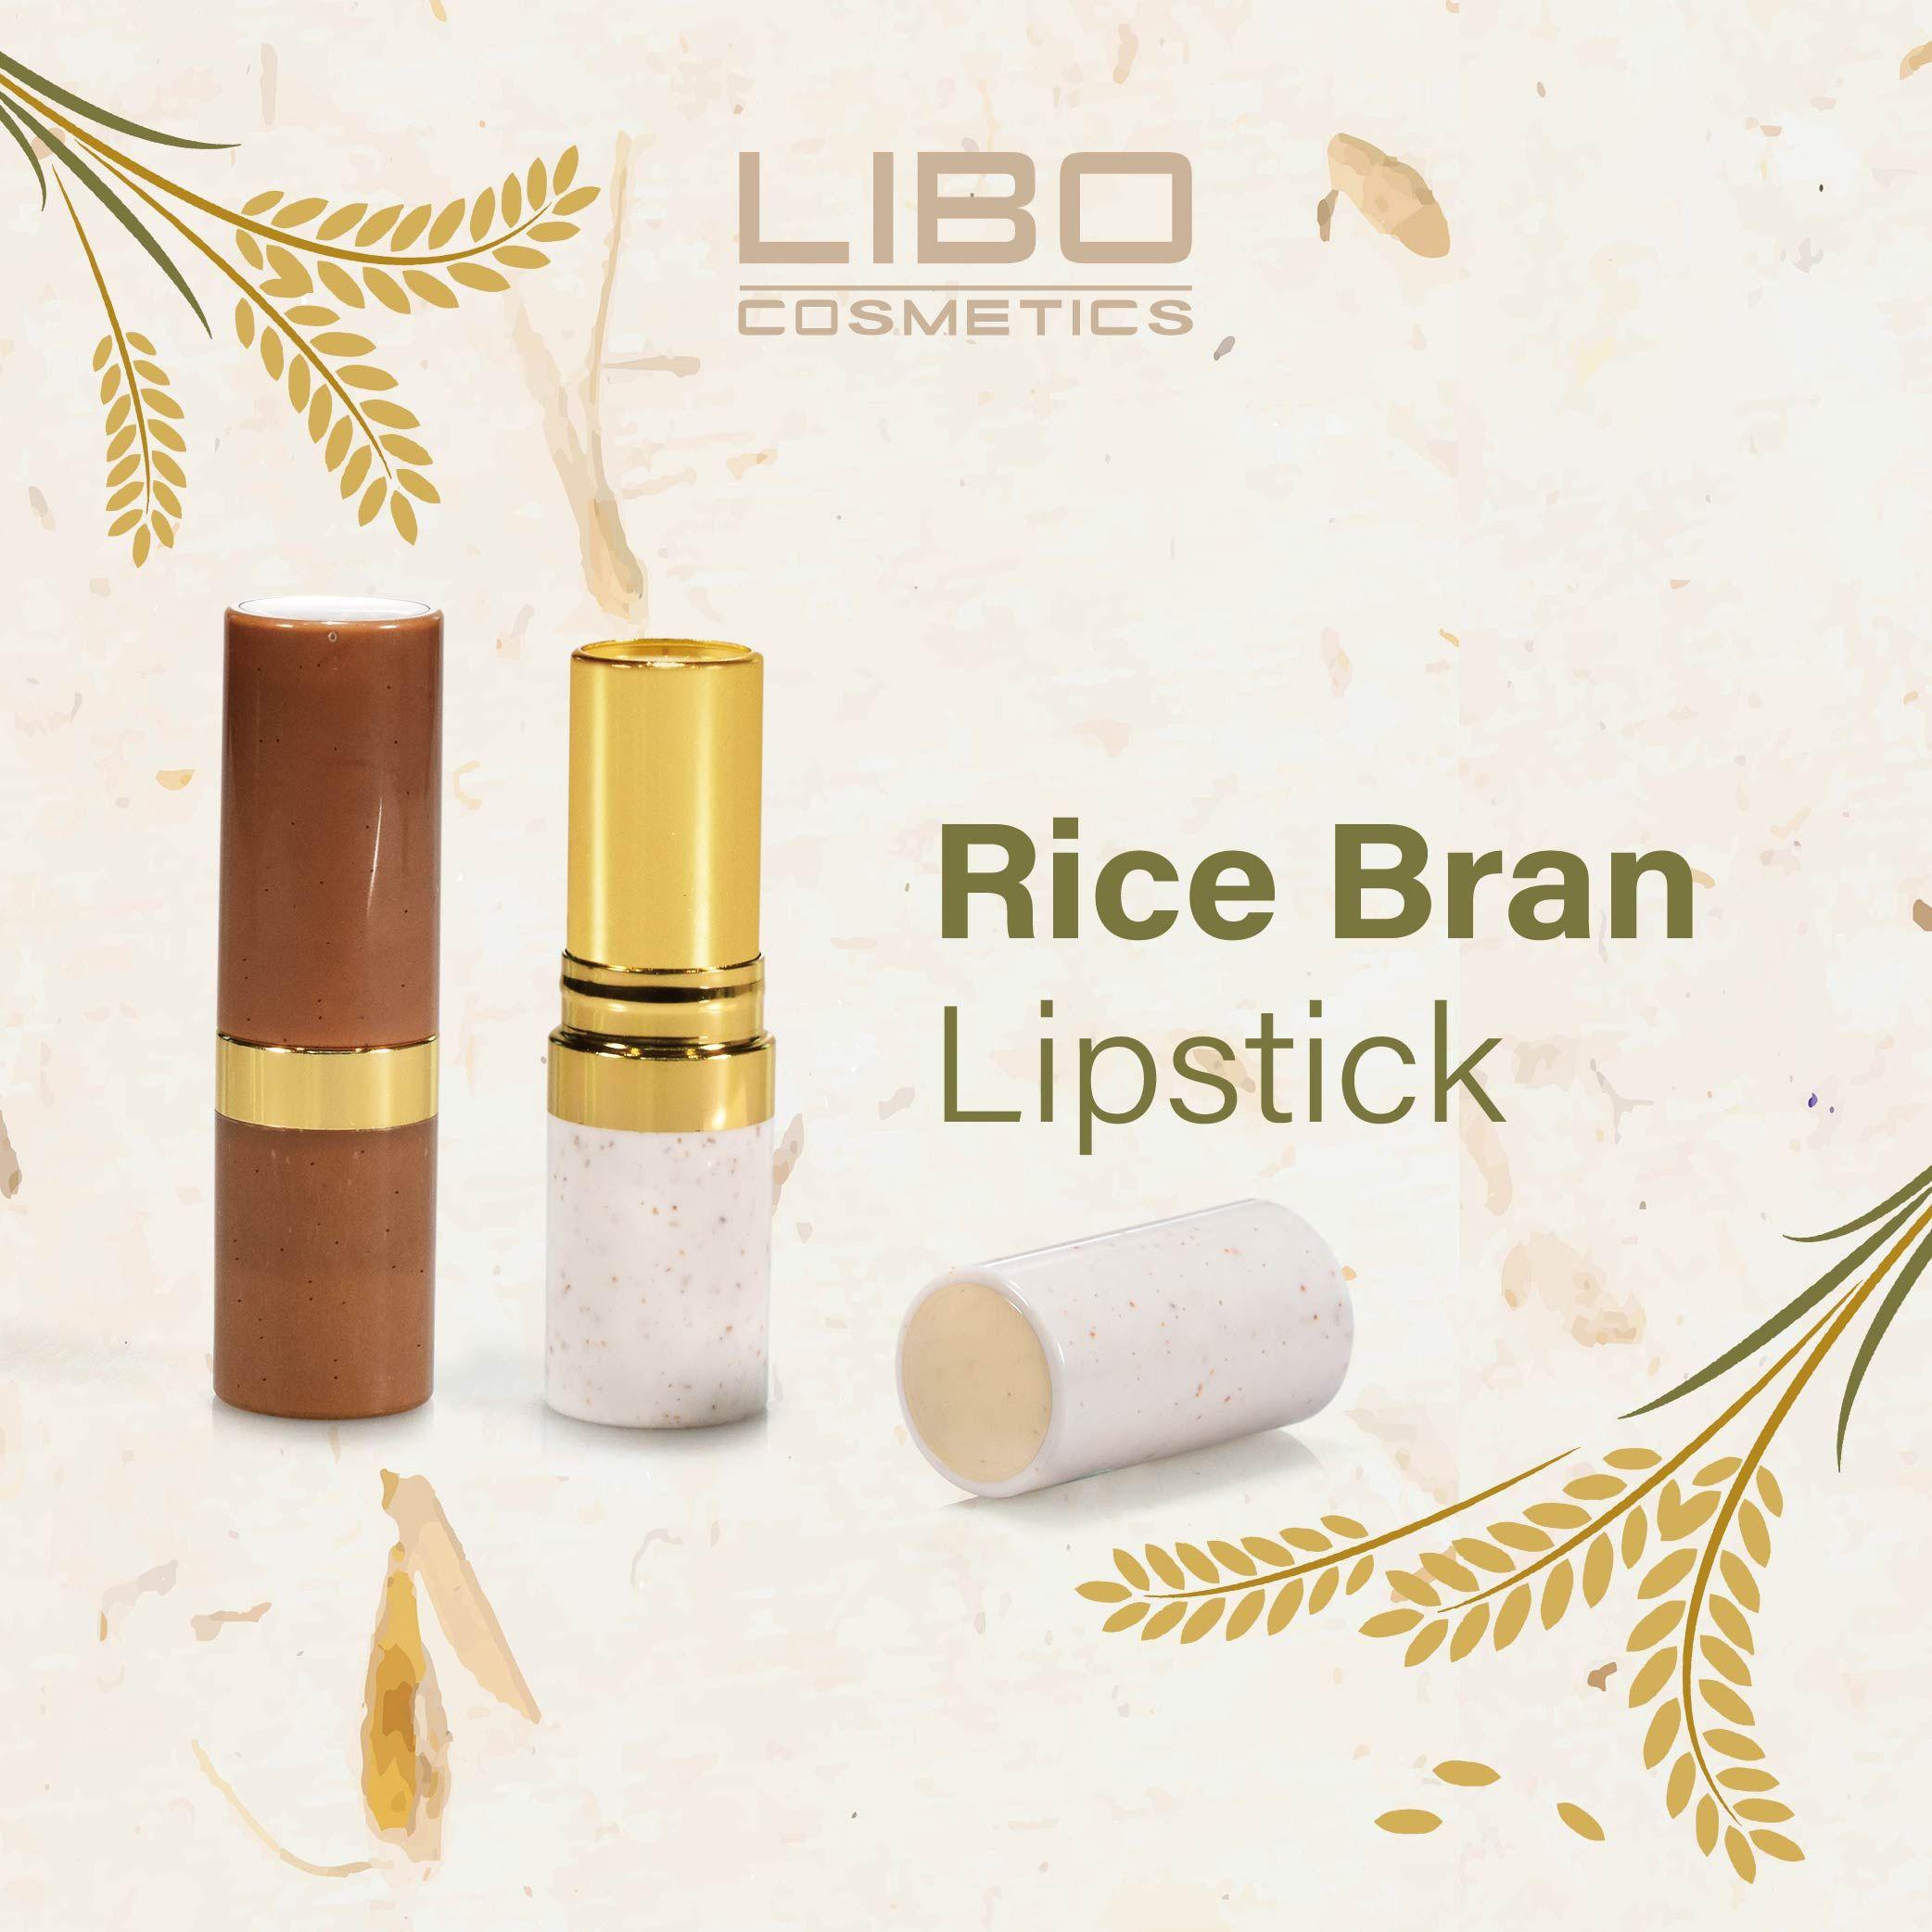 Rice Bran Lipstick in 2020 Custom lipstick, Cosmetic